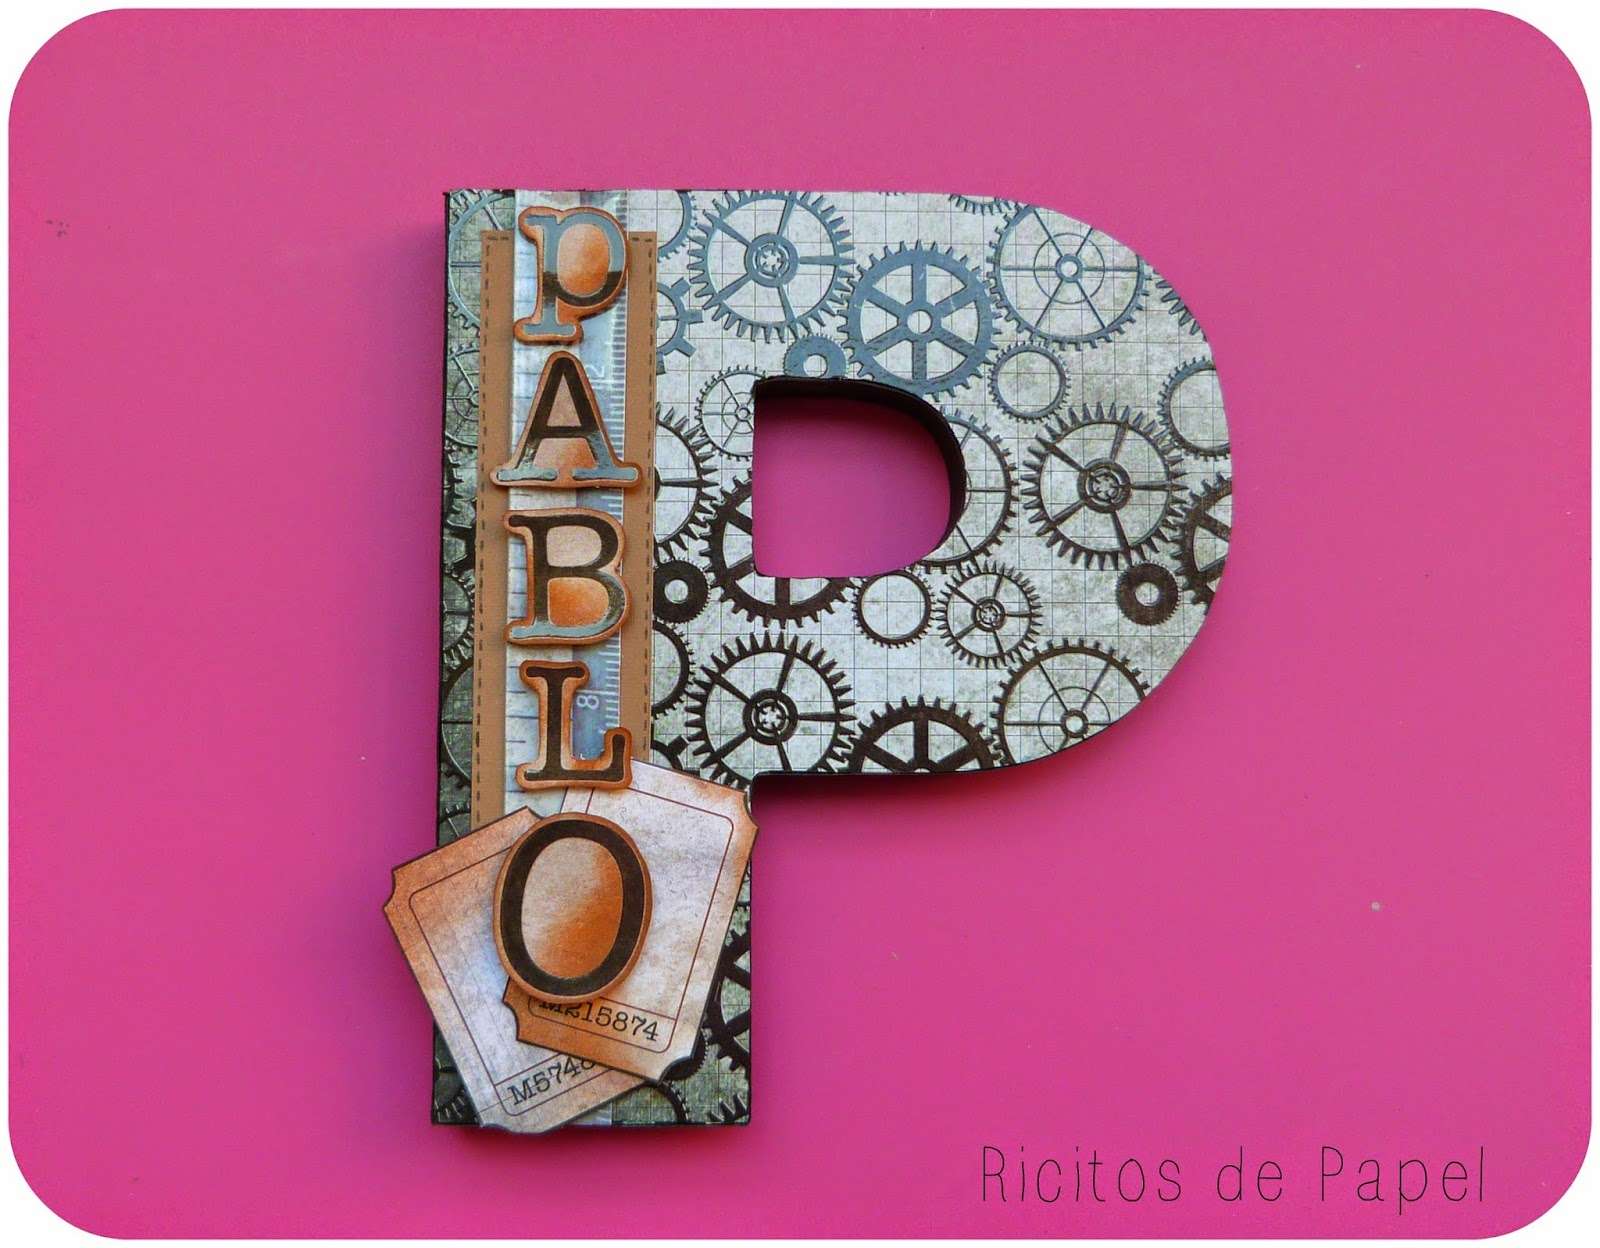 Ricitosdepapel letras decoradas divertidas - Letras grandes decoradas ...